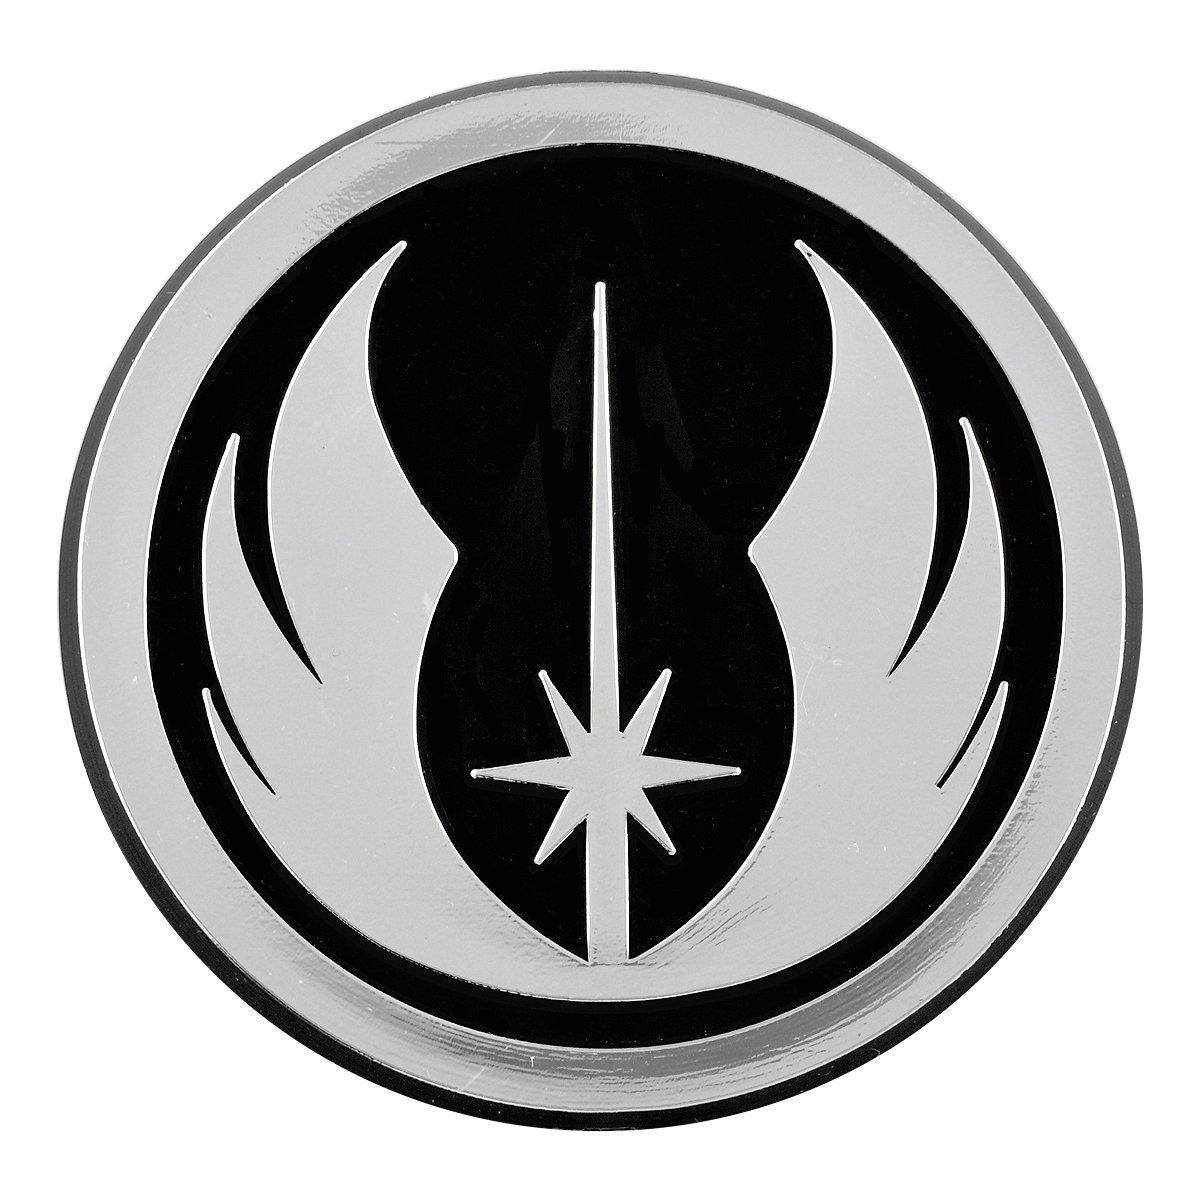 3 x 3 EvolveFISH EF-EMB-P-00074 Jedi Order Logo Chrome Auto Emblem